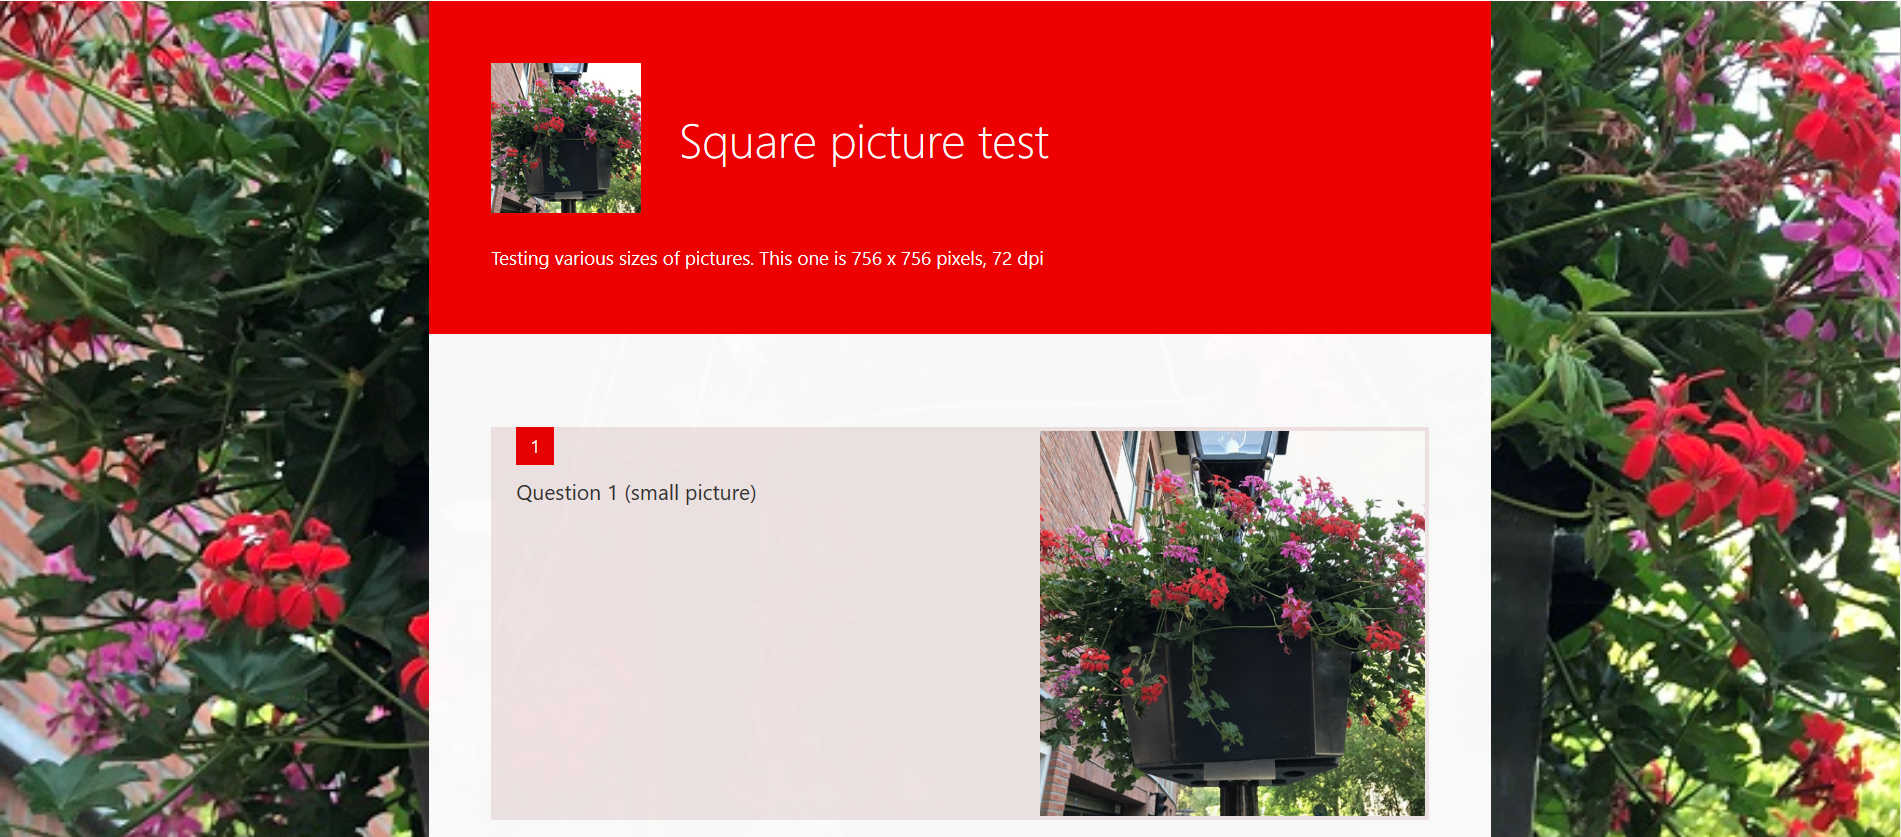 Formfoto-squarebackground.png